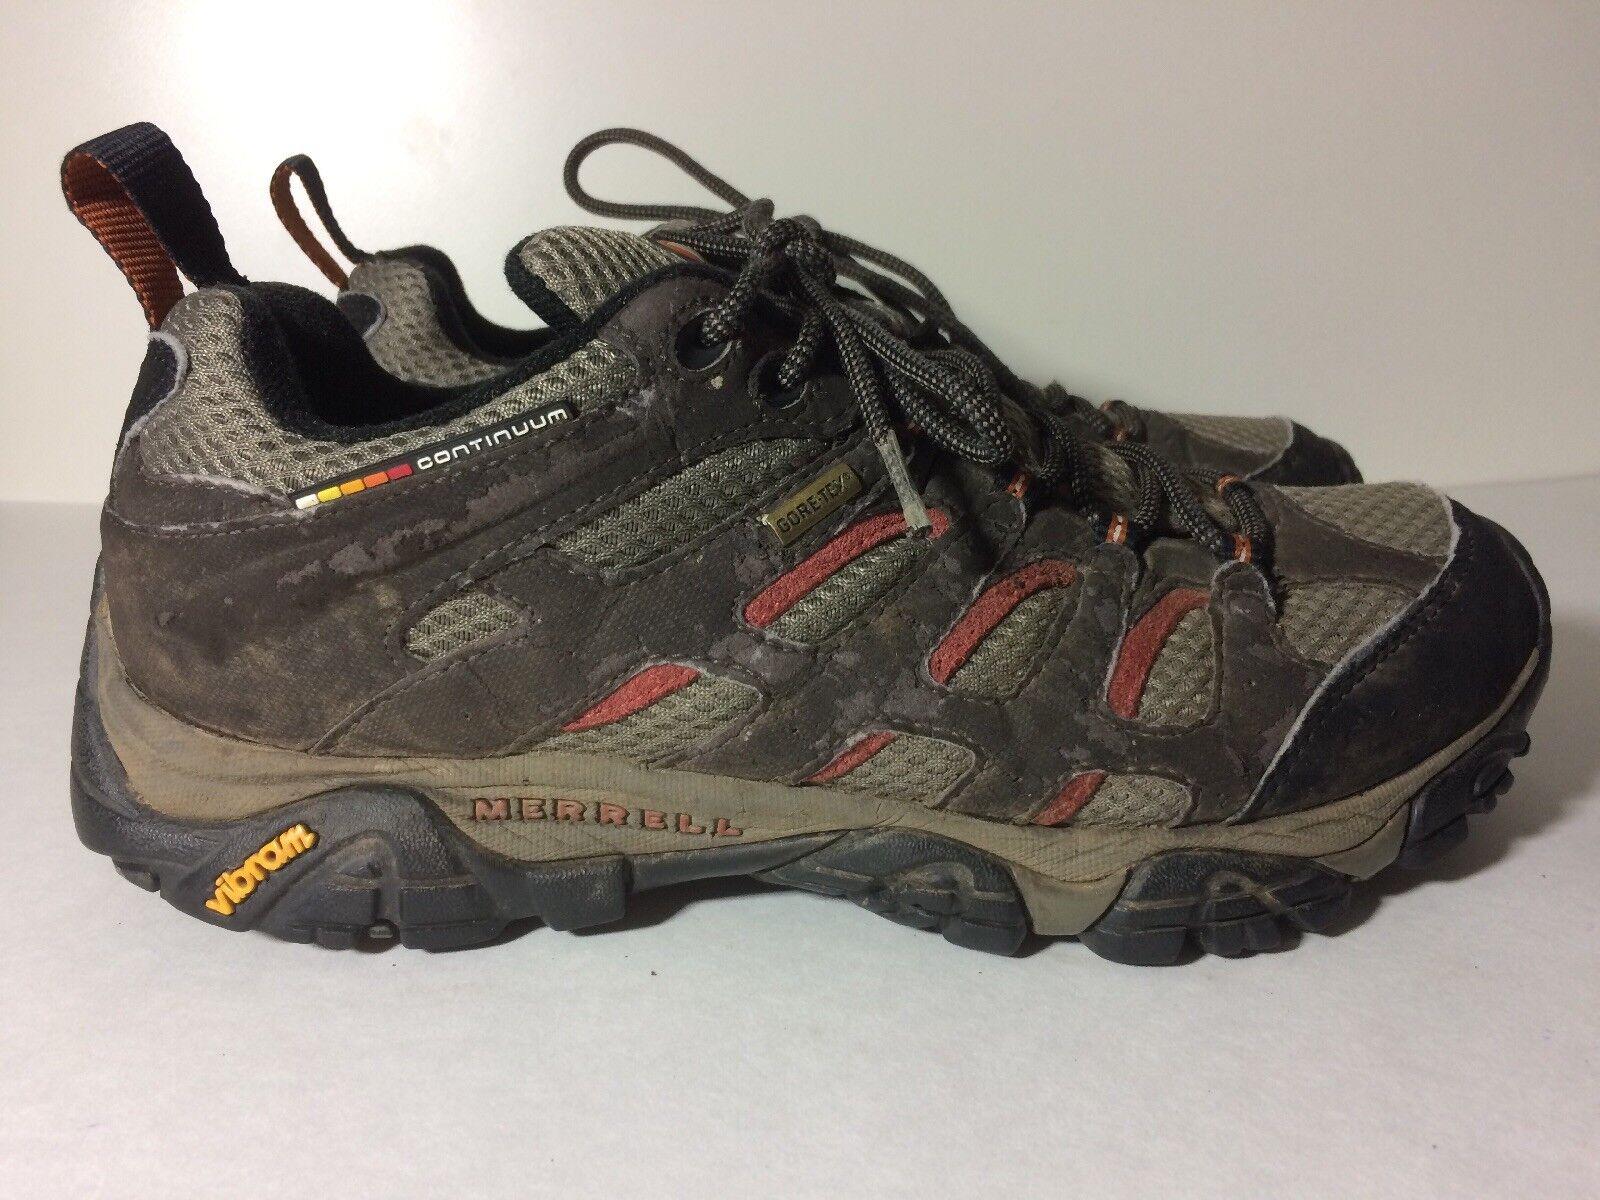 purchase cheap f1567 7bcc4 Merrell Men s Moab Gore-Tex XCR Hiking Shoe Dark Dark Dark Chocolate J87323  Size 8 M 84cc52